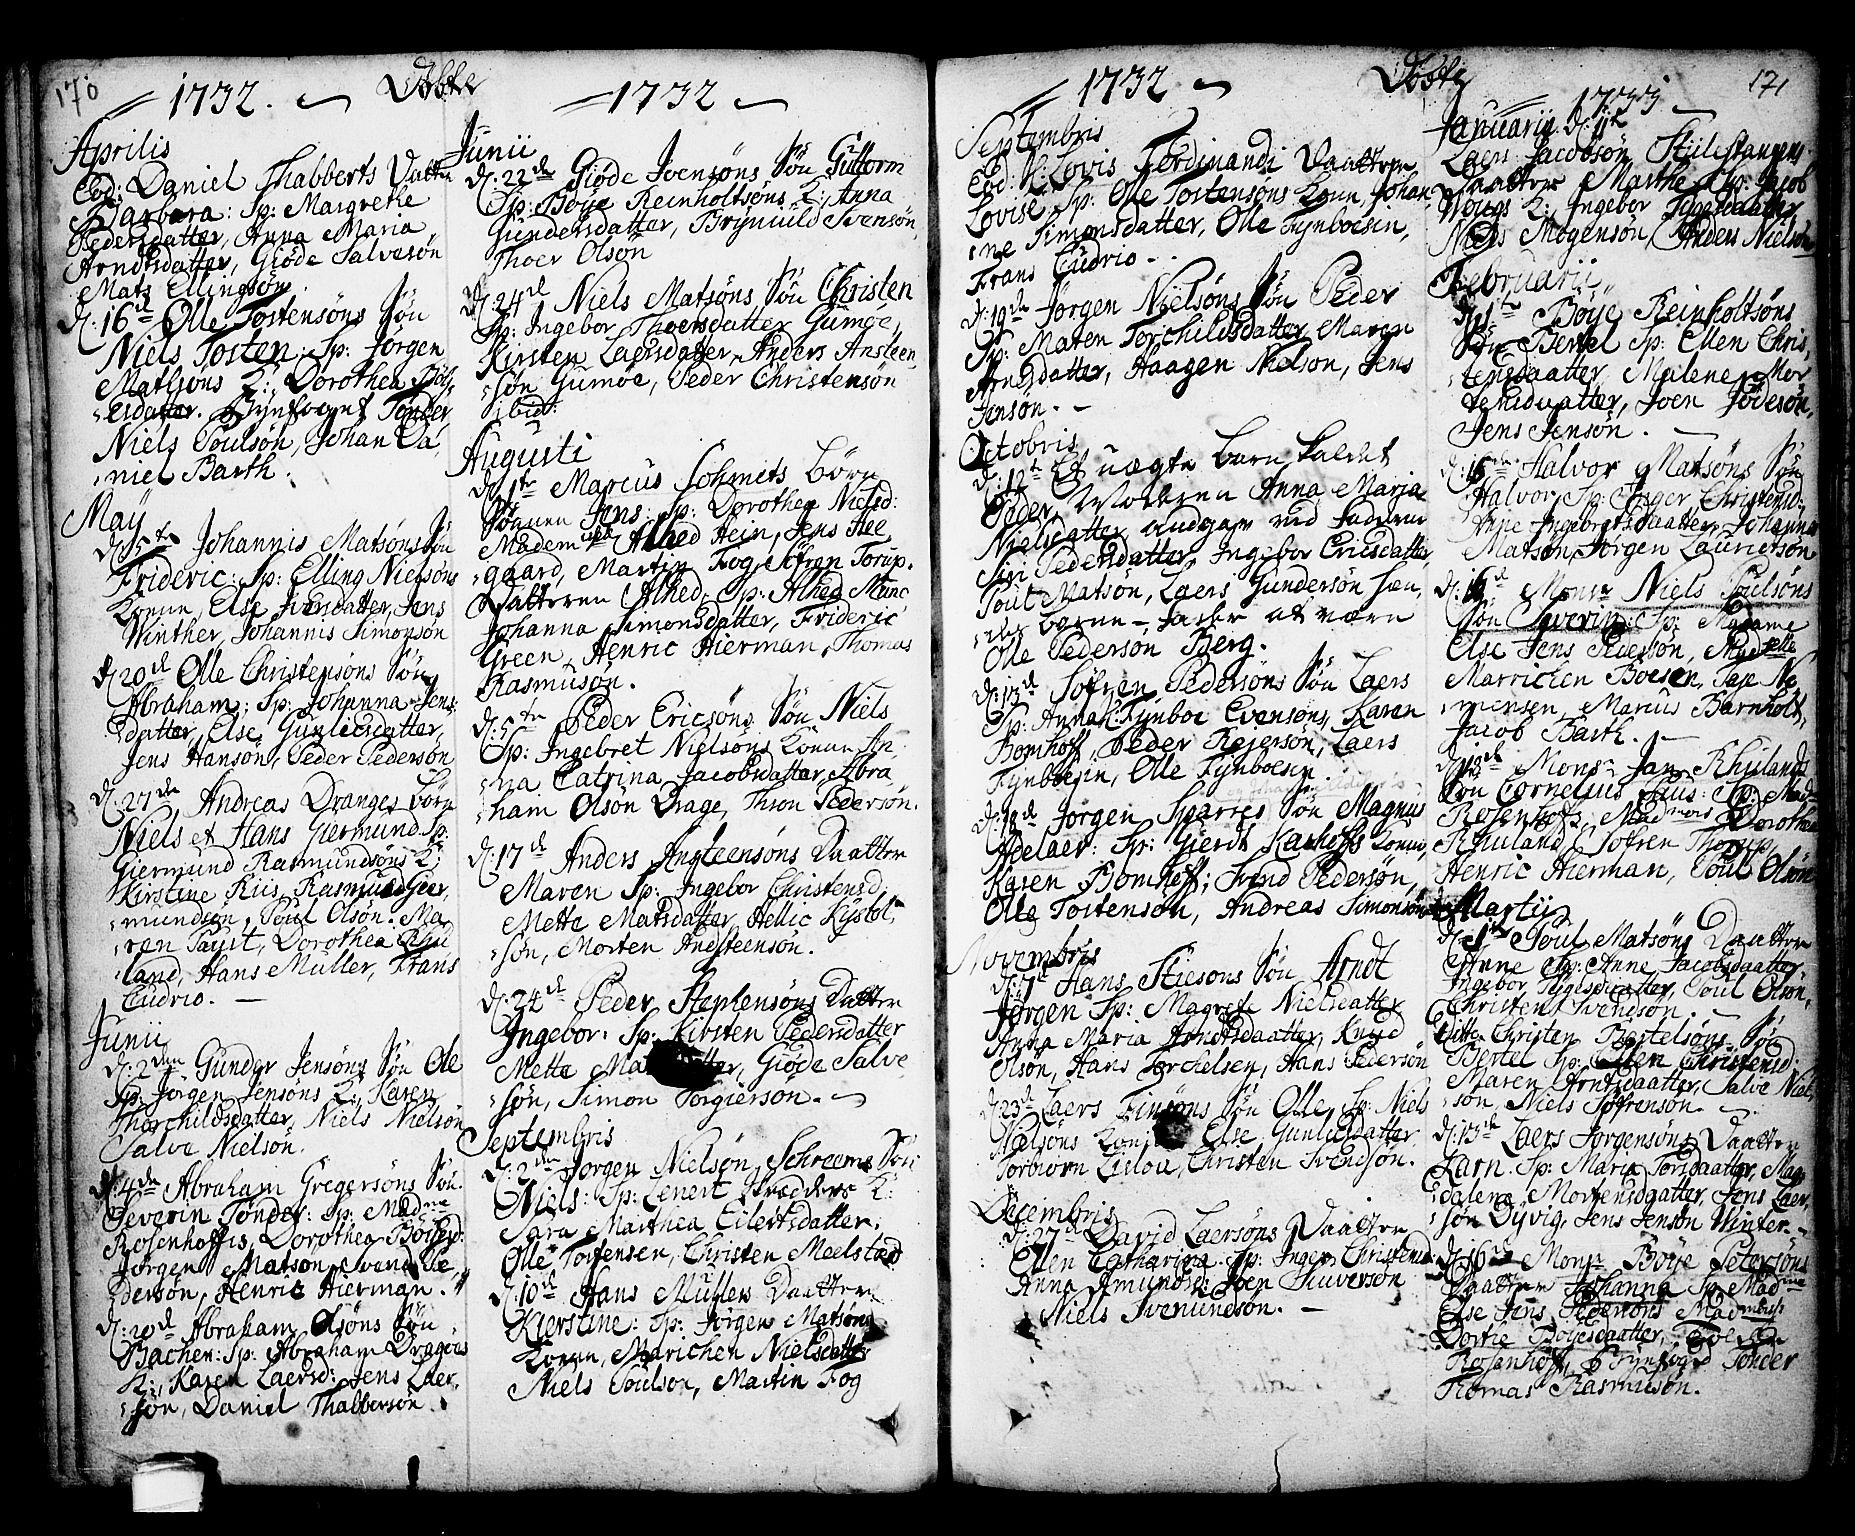 SAKO, Kragerø kirkebøker, F/Fa/L0001: Ministerialbok nr. 1, 1702-1766, s. 170-171